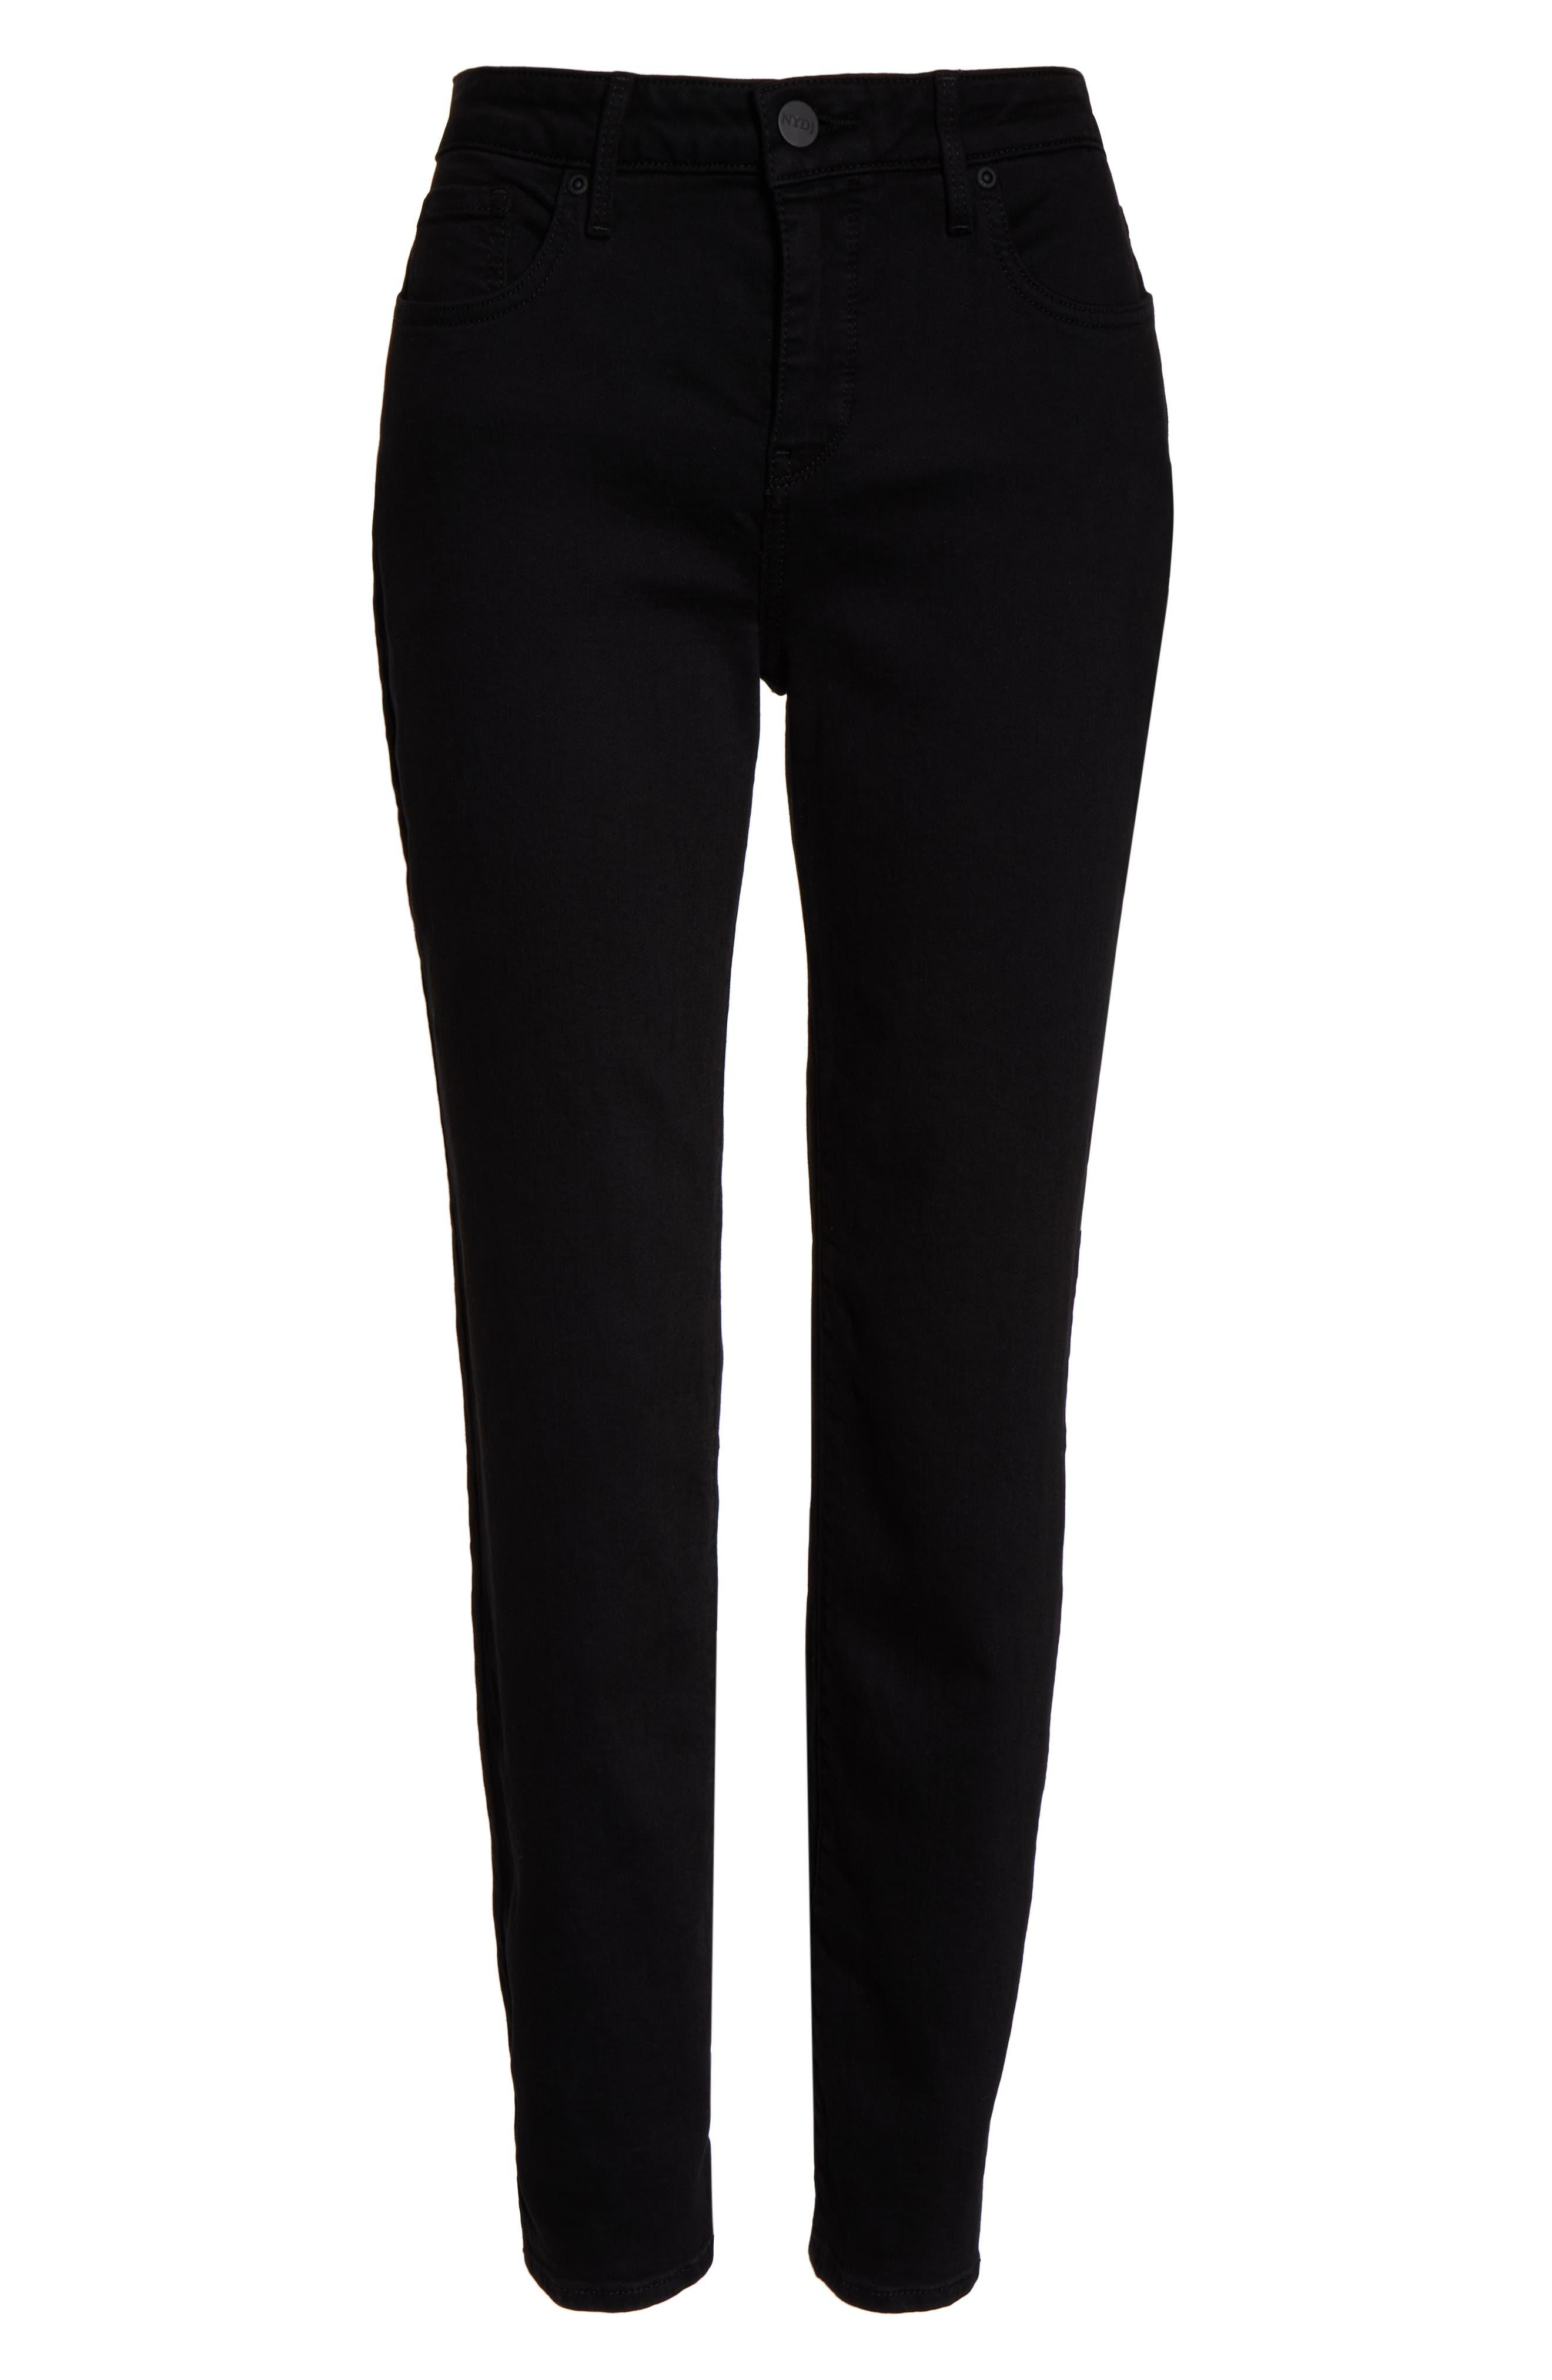 CURVES 360 BY NYDJ,                             Slim Straight Leg Ankle Jeans,                             Alternate thumbnail 4, color,                             BLACK